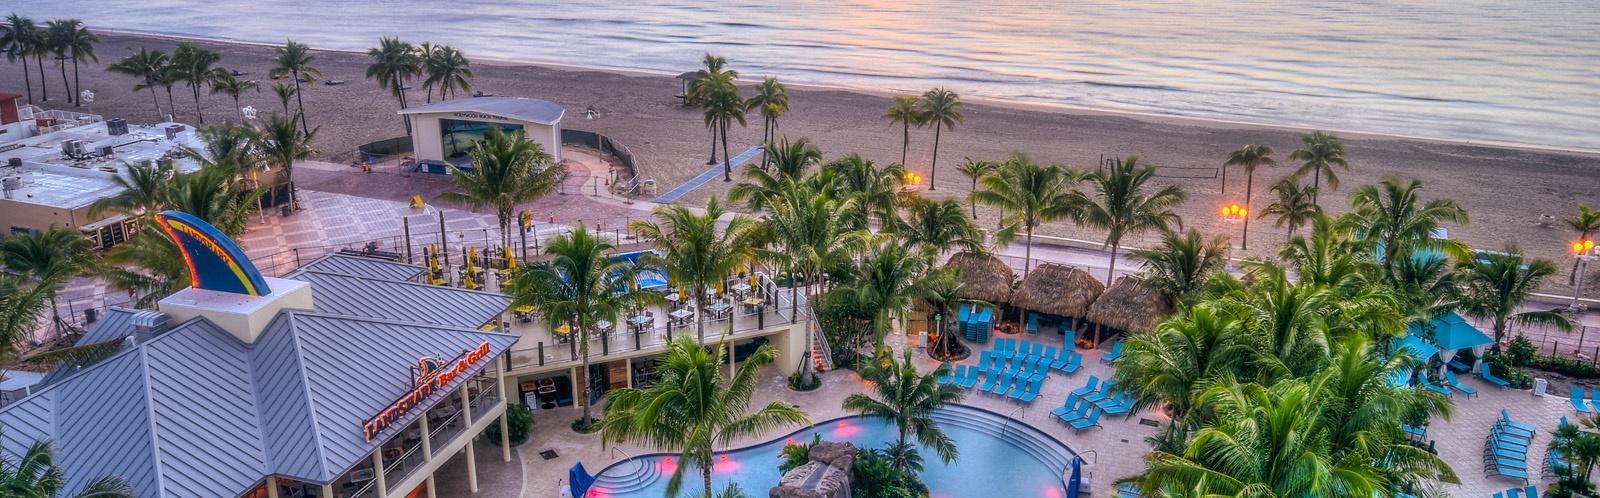 HEFF19 Invite Margaritaville Hollywood Beach Resort.jpg